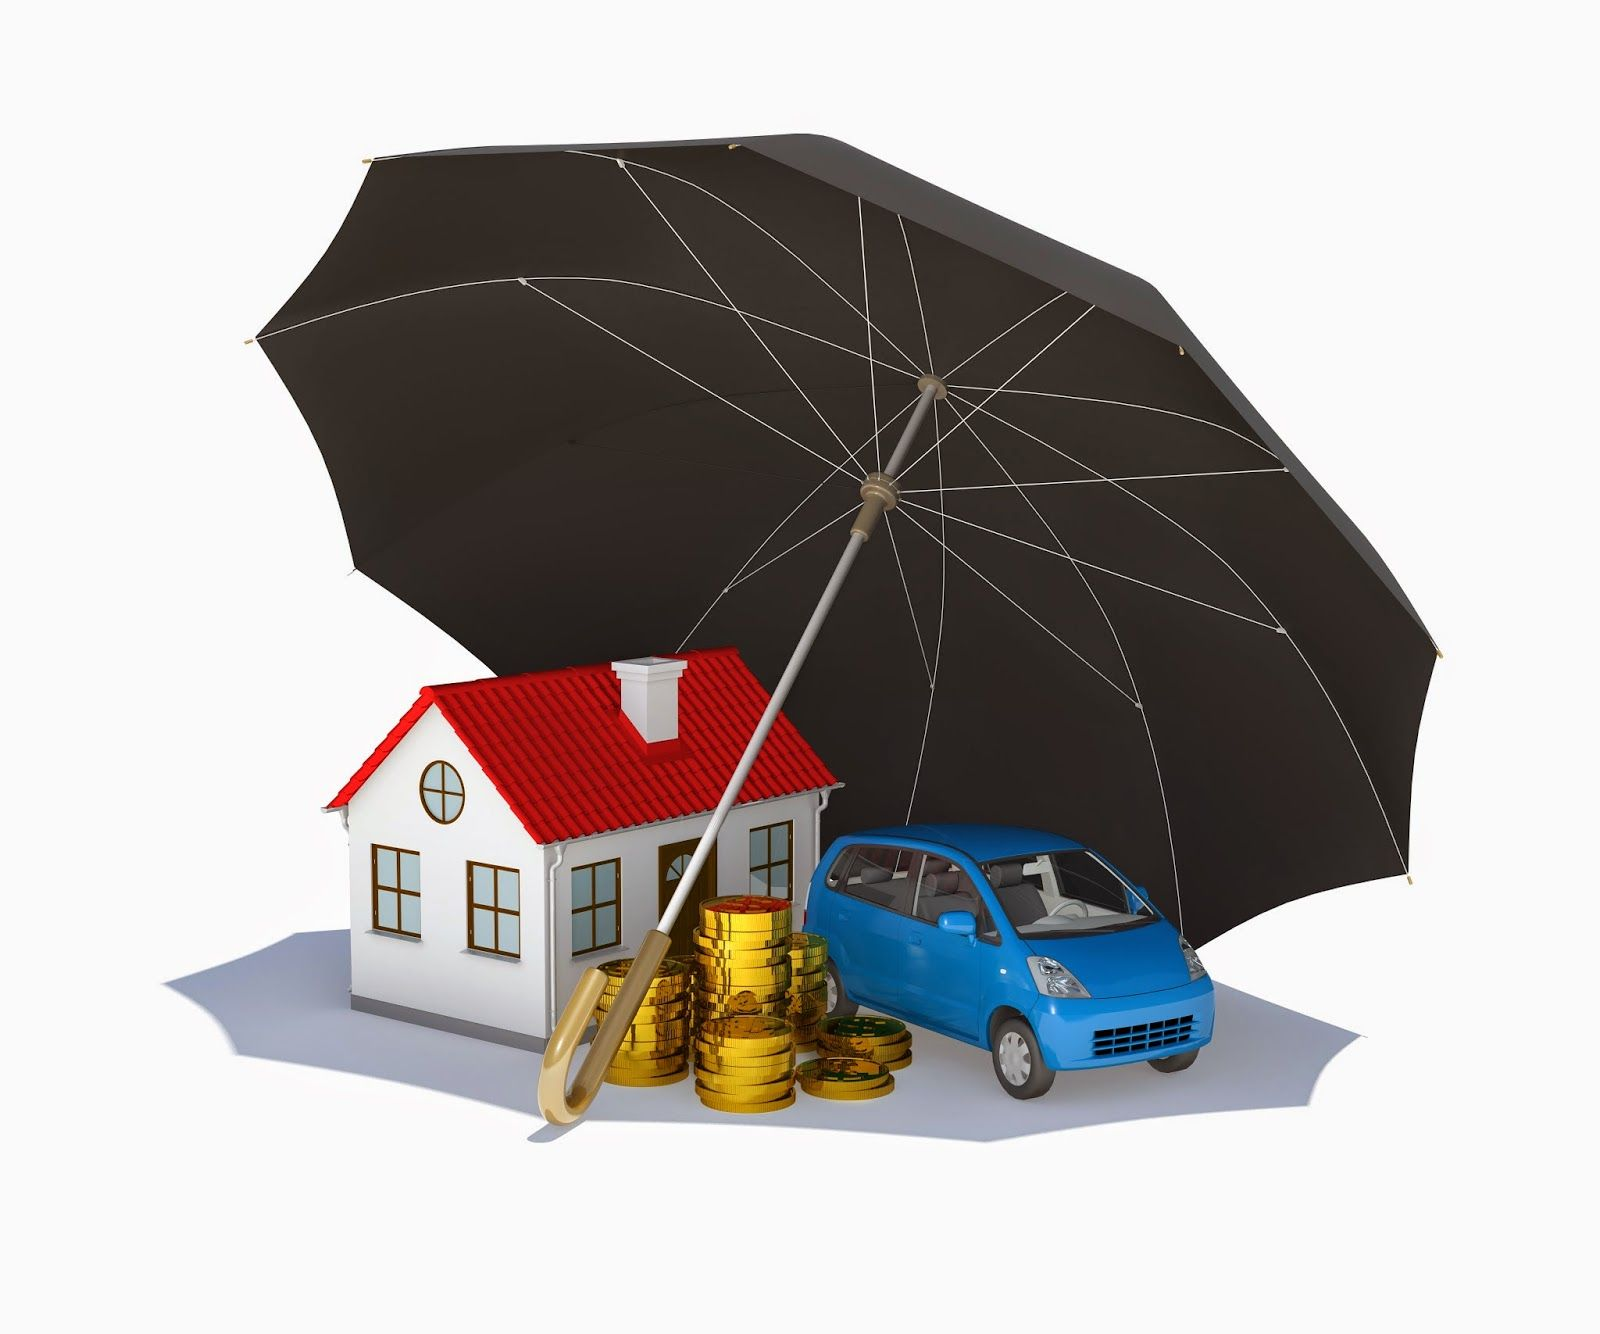 Personal Umbrella Policy Umbrella Insurance Business Insurance